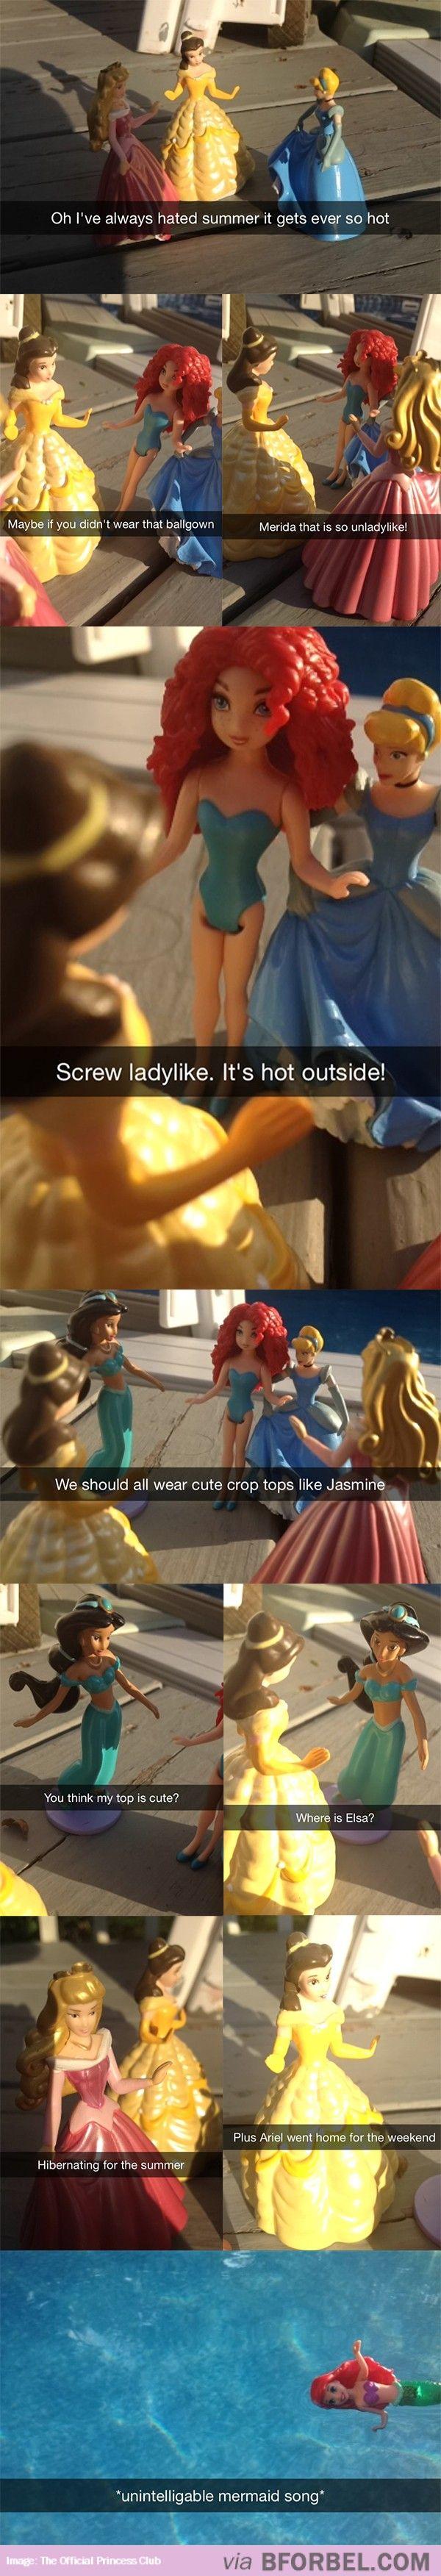 Disney Princess Summer Problems…